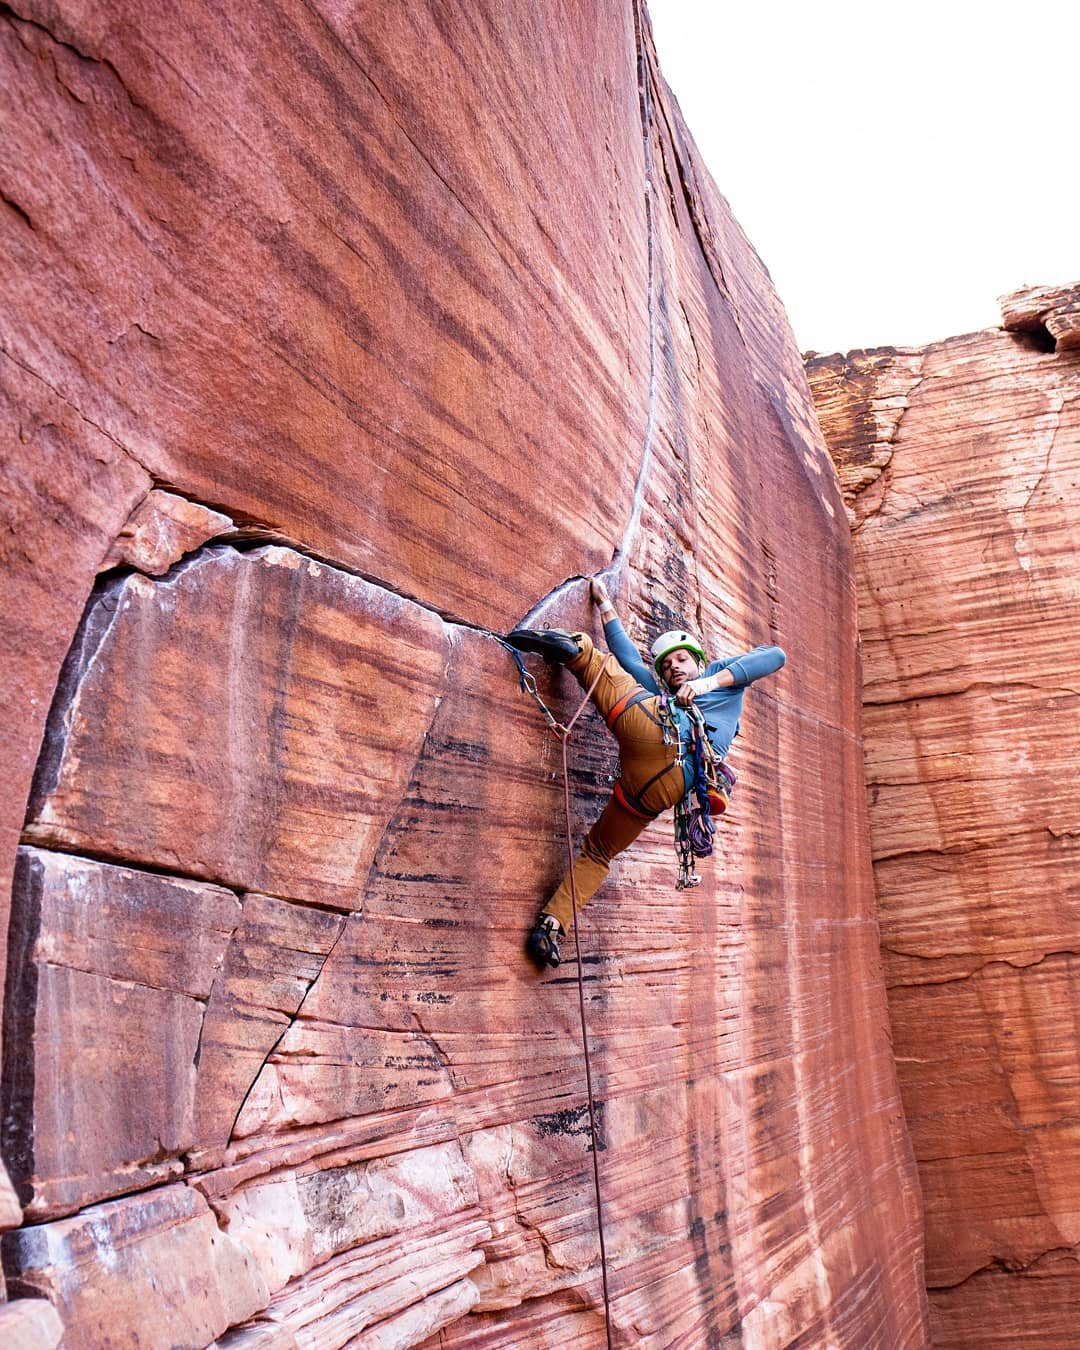 Finding the right piece.  lesinskiadam on Yin and Yang, 11a. . .  #climbingphotography#climbing#climbing_pictures_of_instagram#rockclimbing#outdoors#PlanetGranite #livetoclimb #c_l_i_m_b #climb #timetoclimb#goclimb#aacgram #neverstopexploring #liveclimbrepeat #outdoorphotography #explorenevada #climbing_is_my_passion #getoutdoors #climber #climbing_worldwide #rei1440project #climbing_goals #climbon #climbingprojects #tradisrad #touchstoneclimbing #CanIFocus2019 #climbinglife #rockandice #climbingisbliss